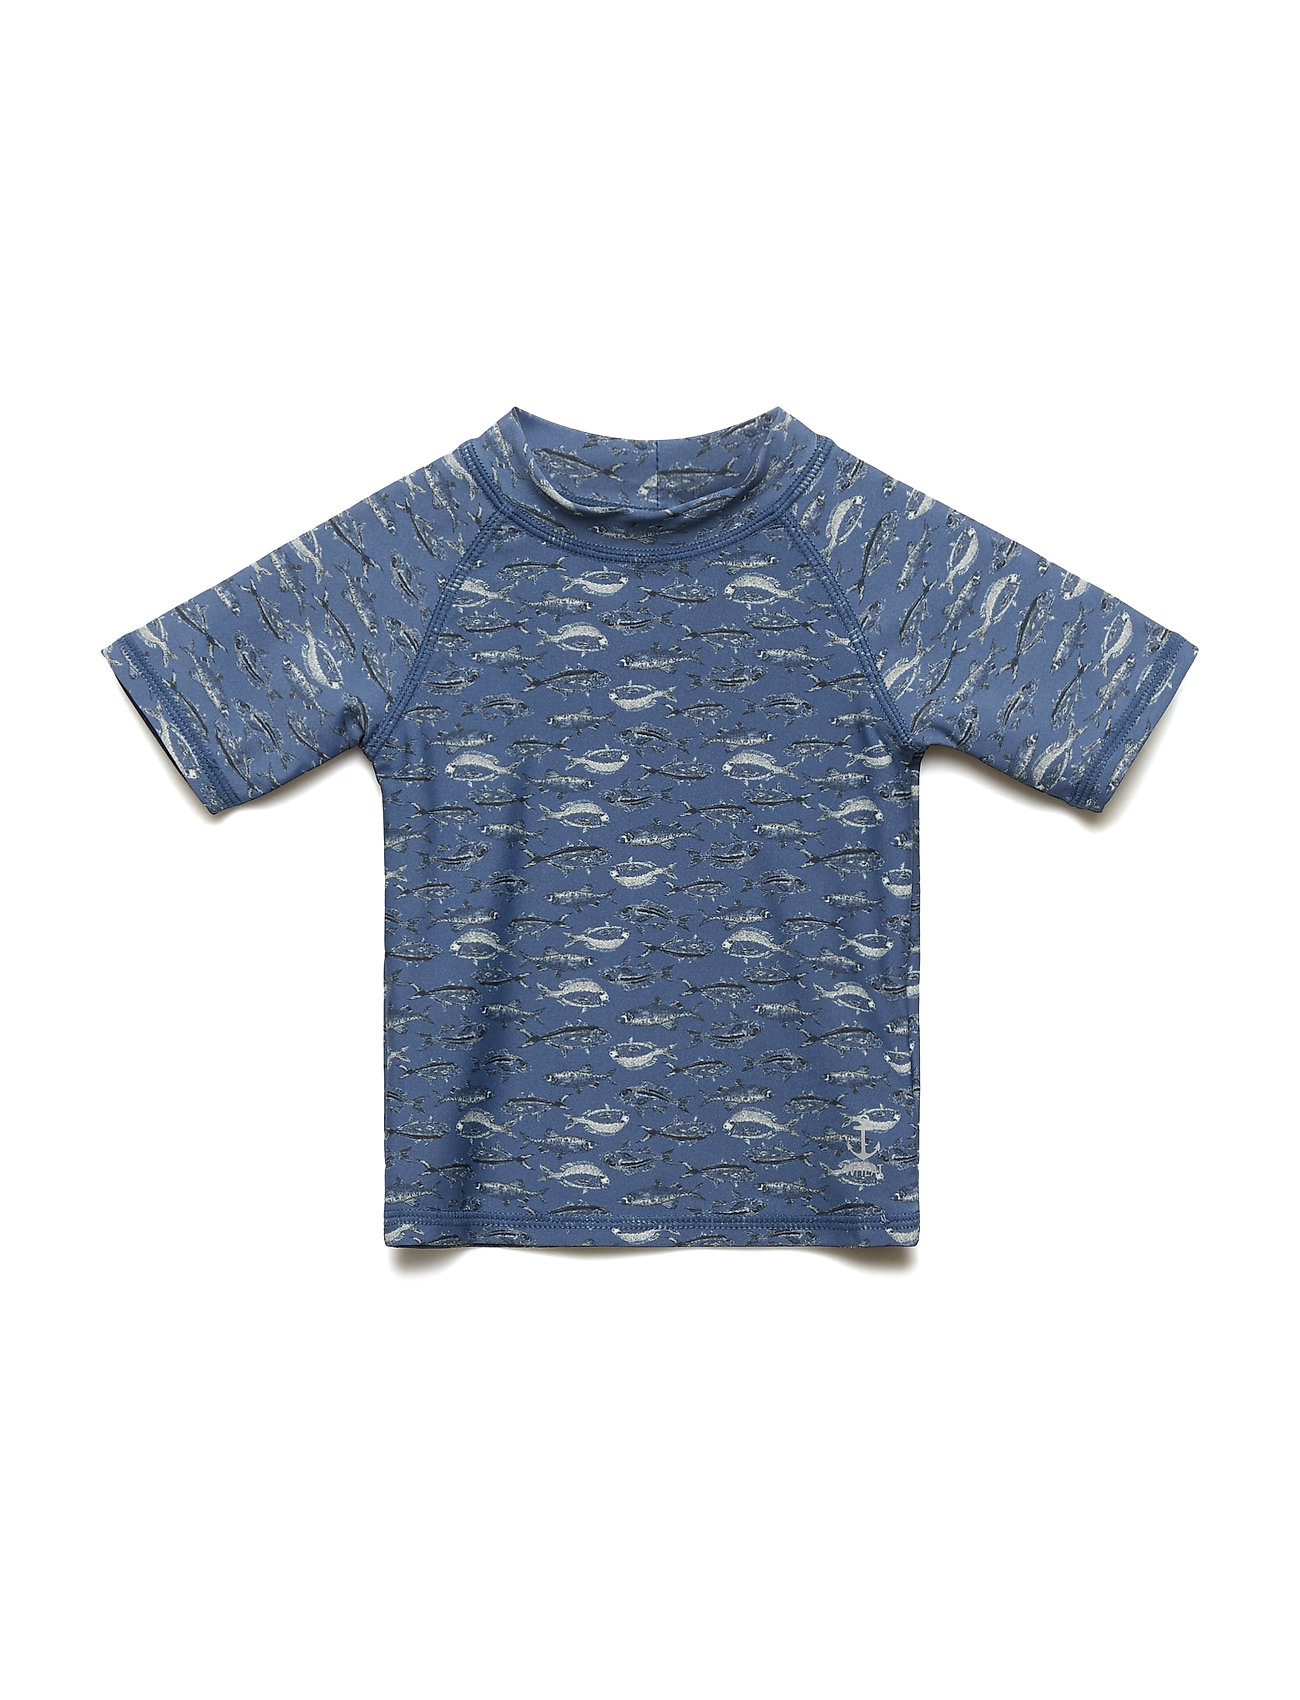 Wheat Swim T-Shirt Jackie SS - BERING SEA